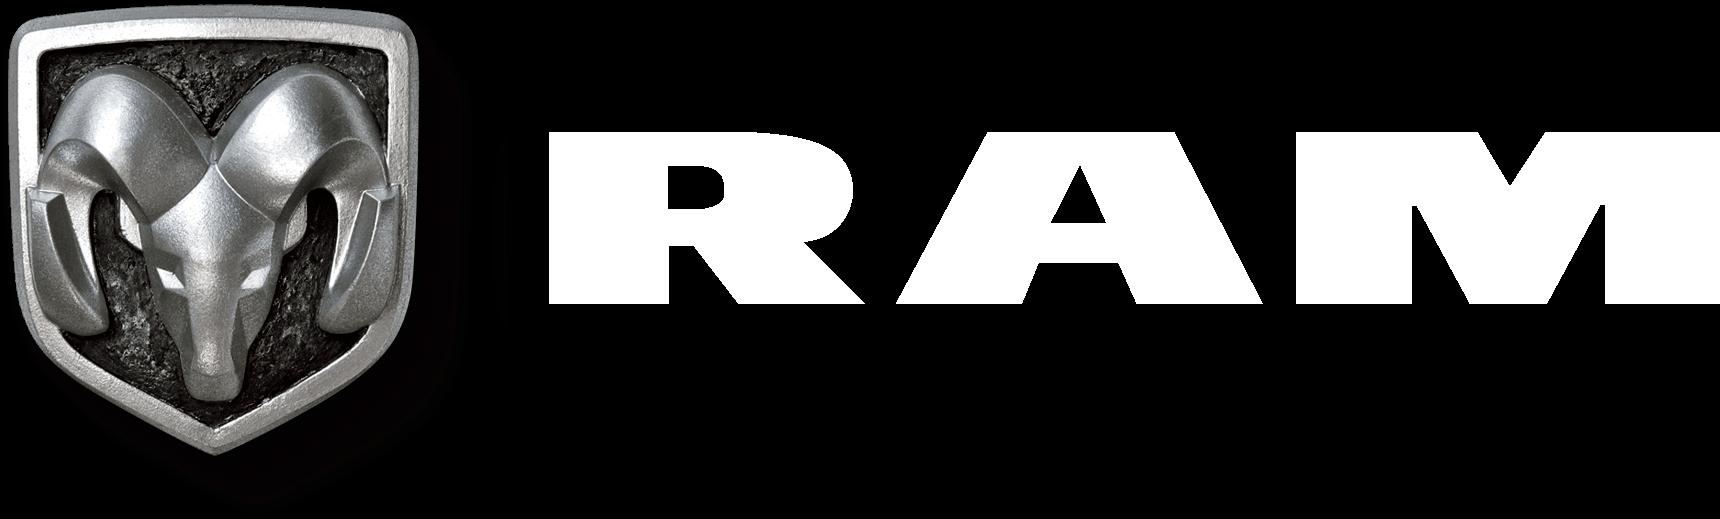 Superb Honda · Acura · Ford Chrysler Jeep Dodge RAM · Jerry Damson Automotive Group